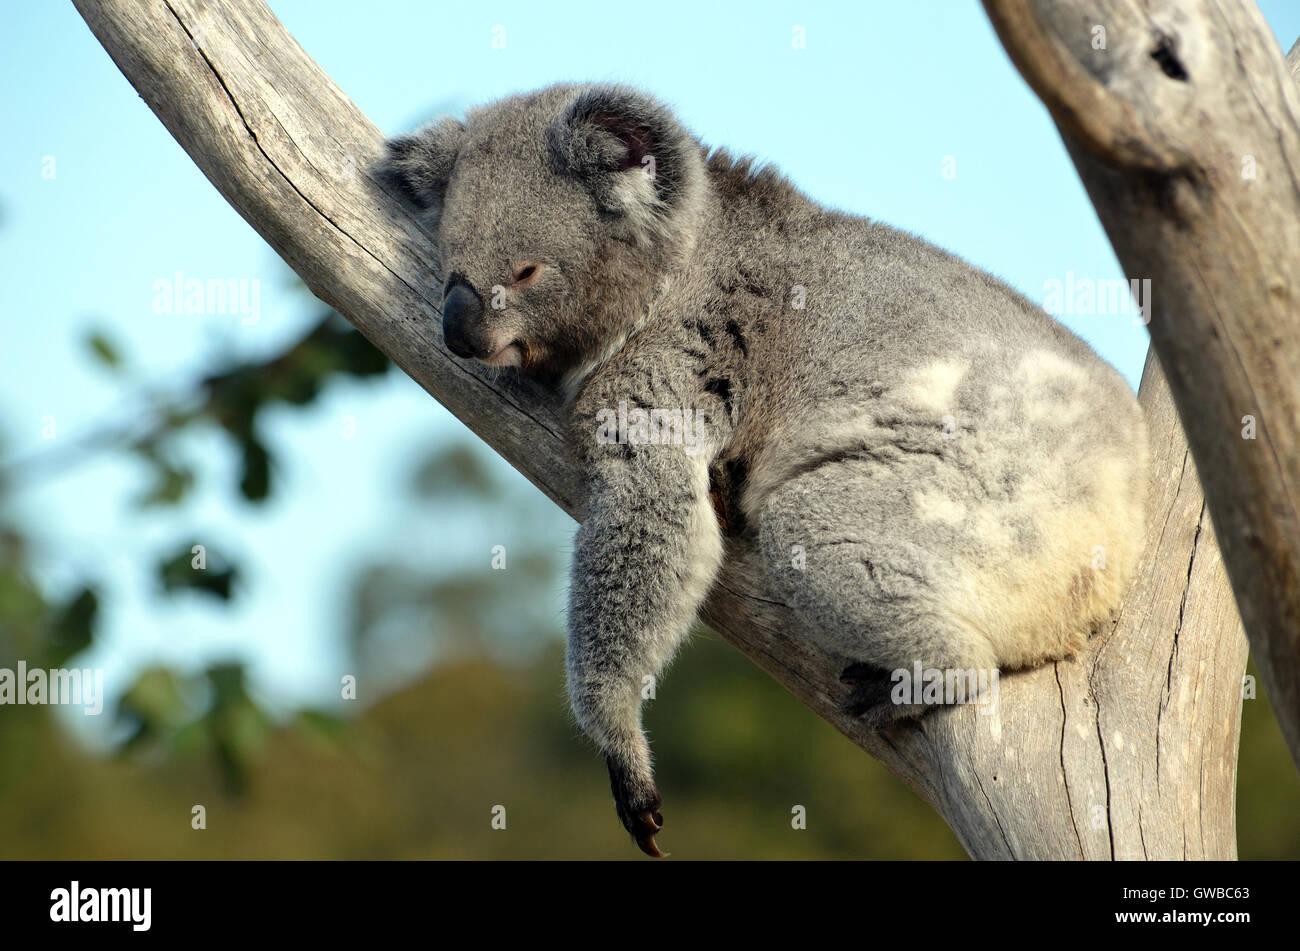 Australian Koala (Phascolarctos cinereus) sleeping in a gum tree. Australia's iconic marsupial mammal. Stock Photo